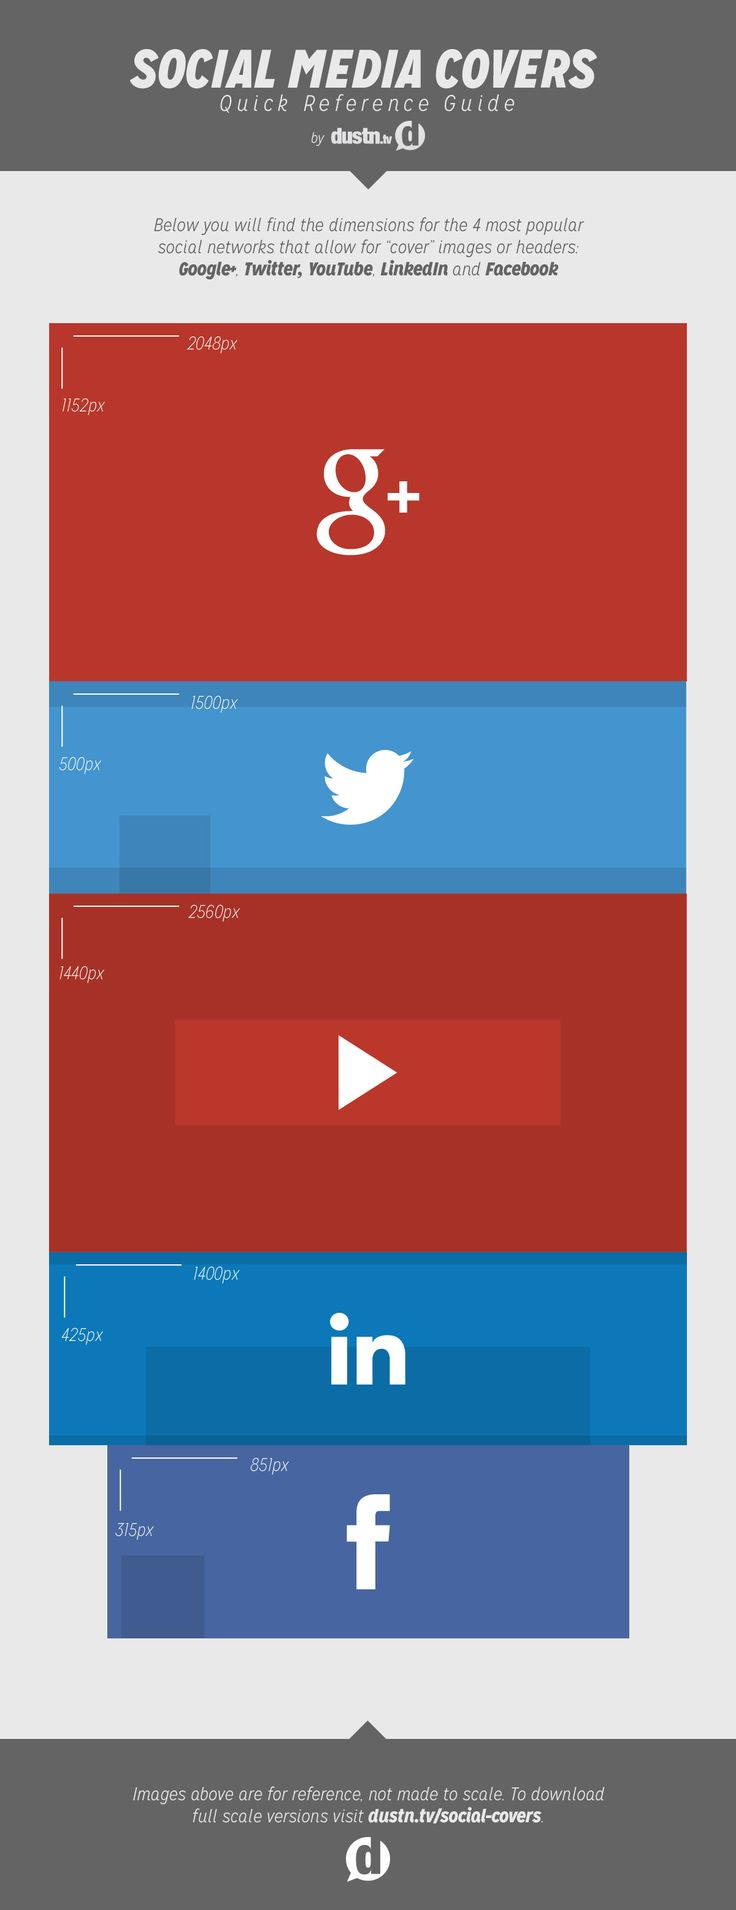 Social Media Cover Photo Dimensions - dustn.tv